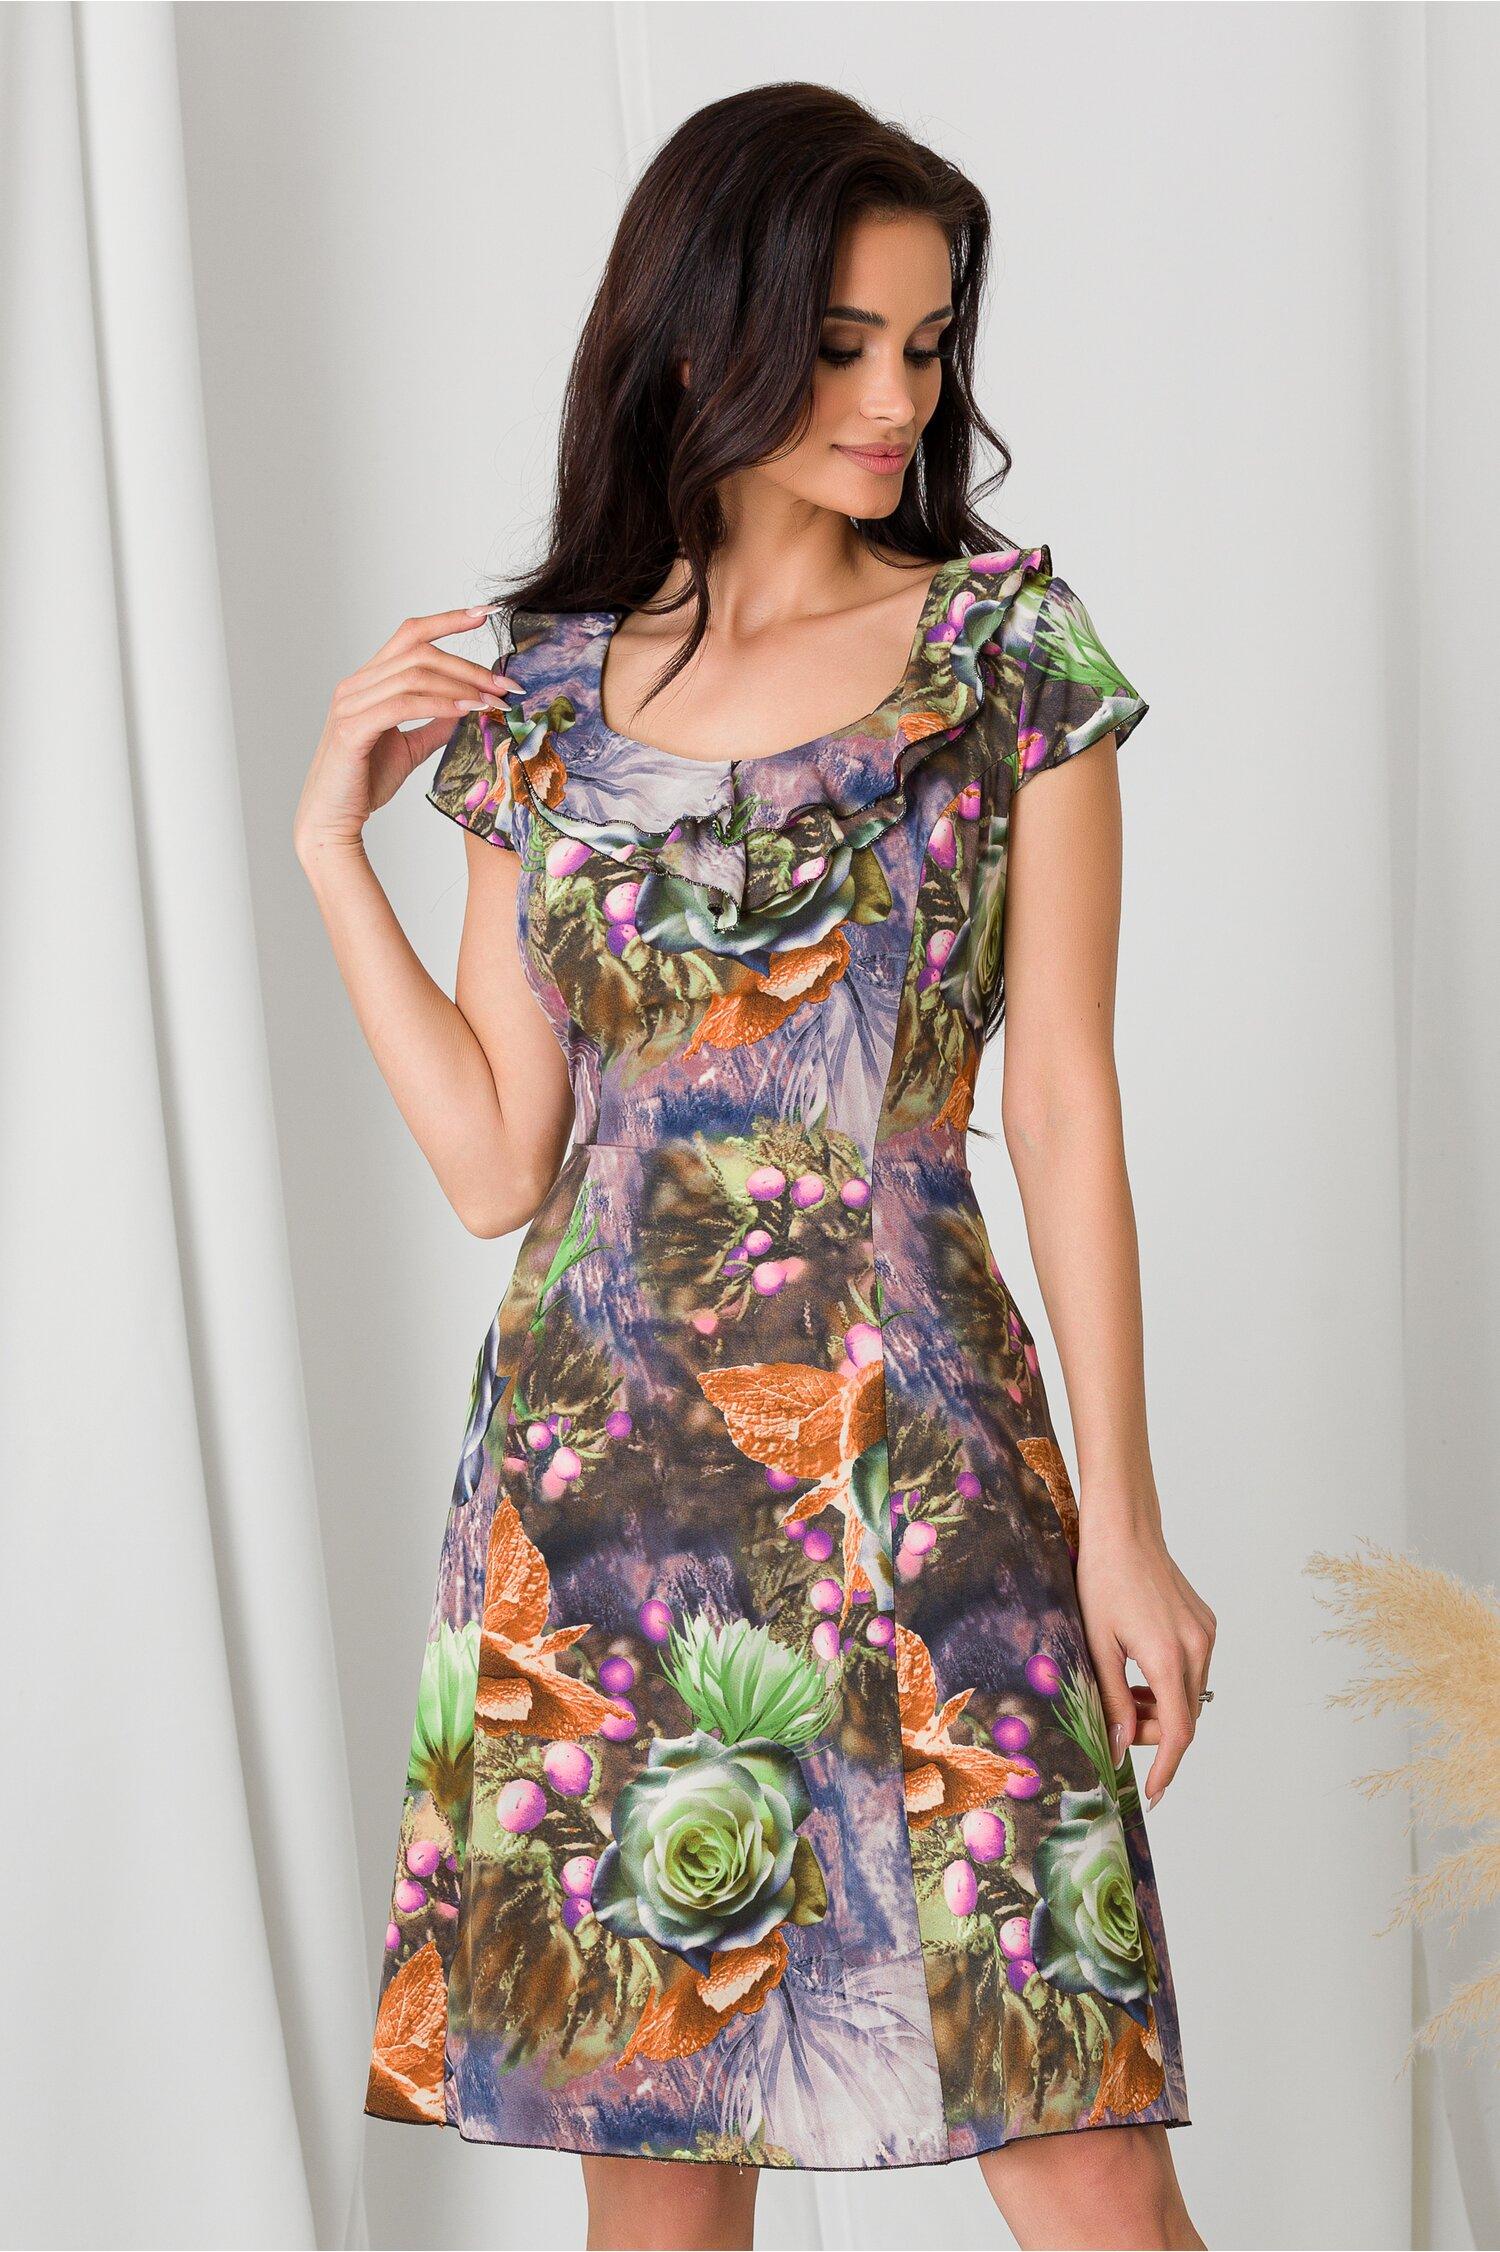 Rochie Kian lila cu imprimeuri in nuante de verde imagine dyfashion.ro 2021